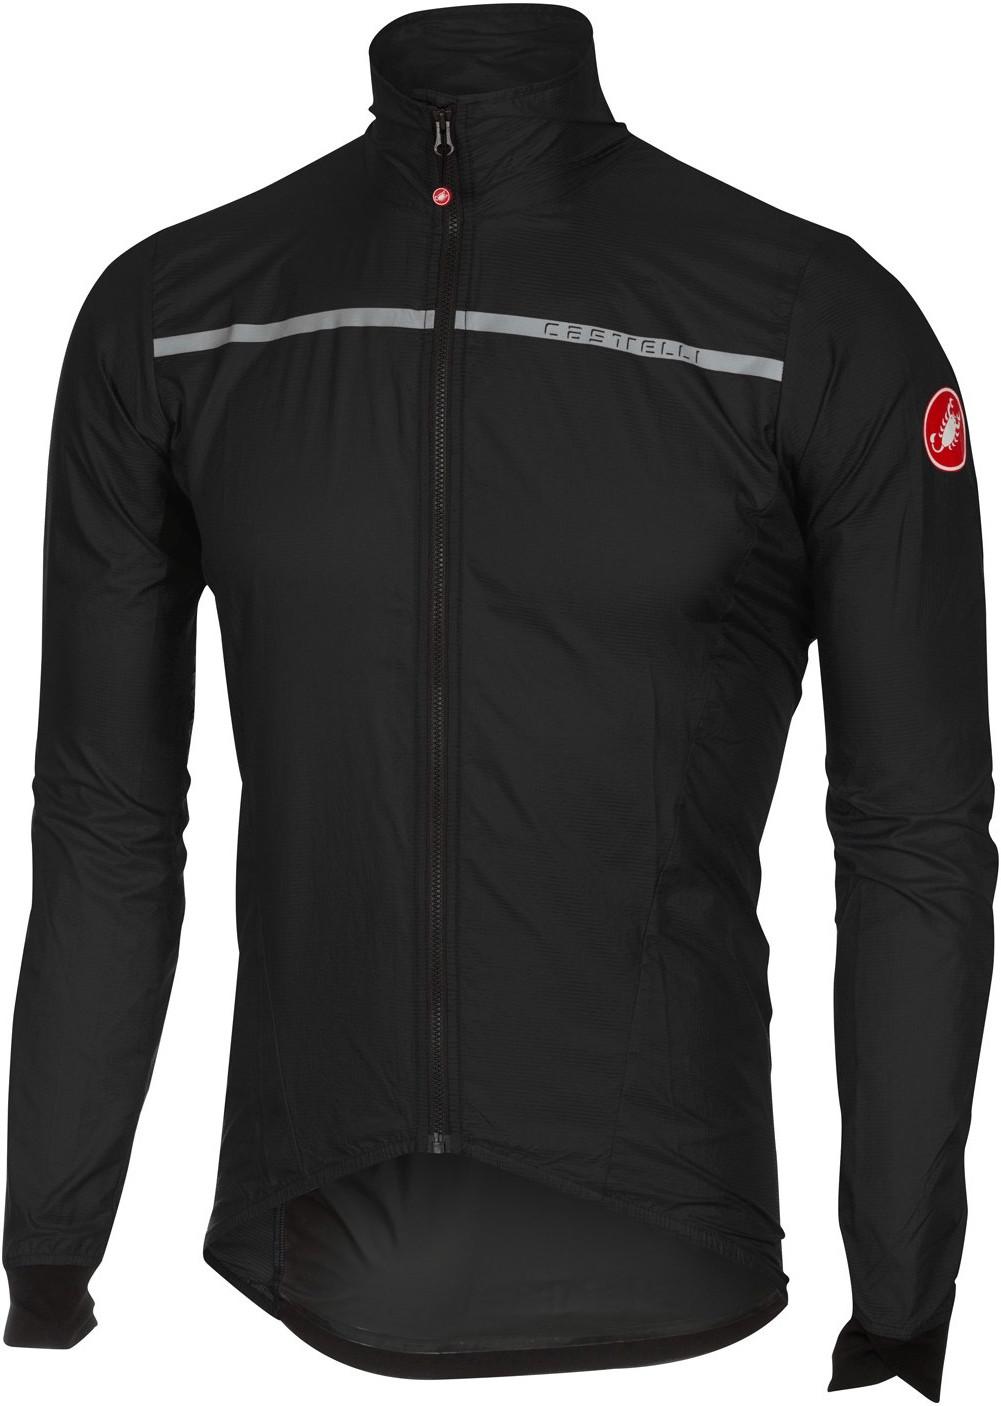 Castelli Superleggera Jacket black